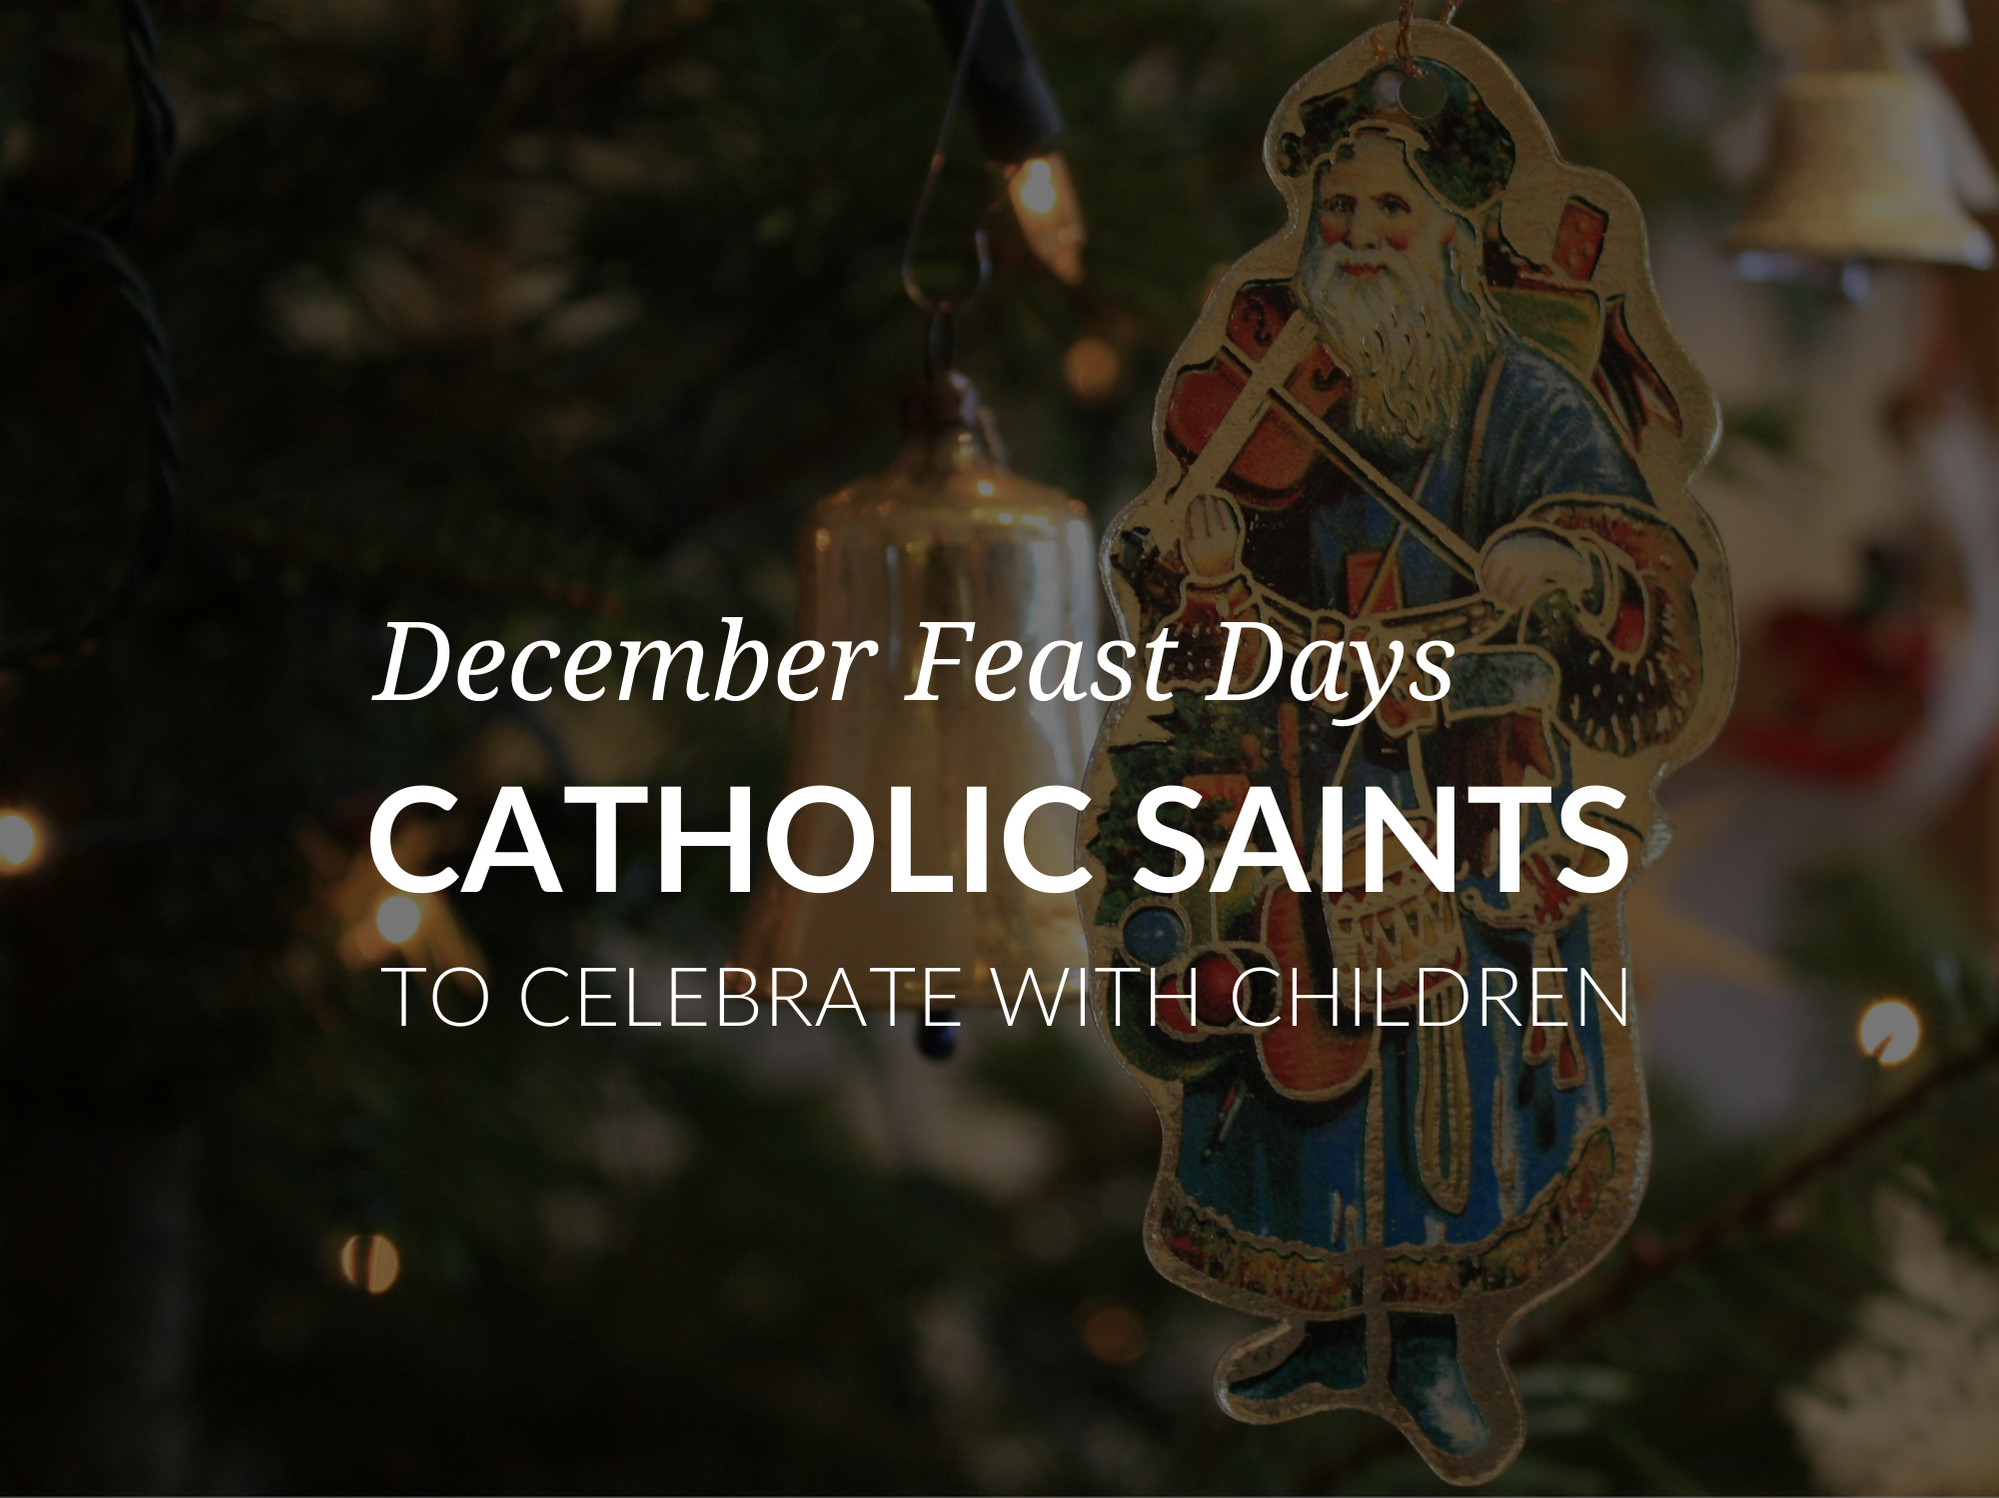 december-feast-days-catholic-saints-celebrate-with-kids